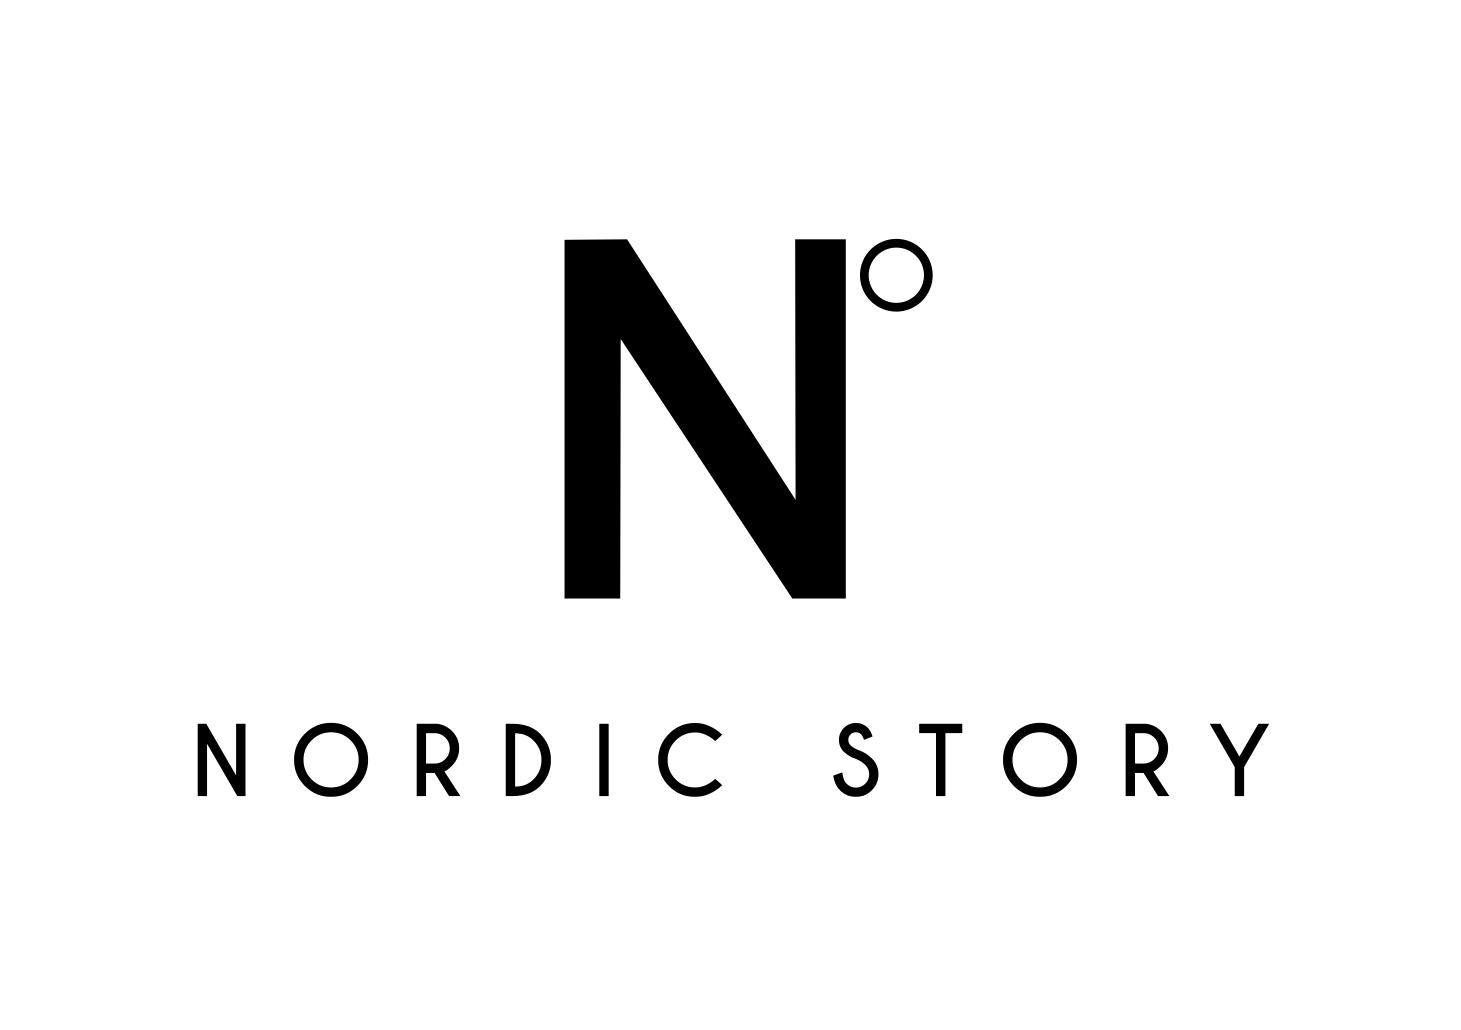 Nordic Story logodesign